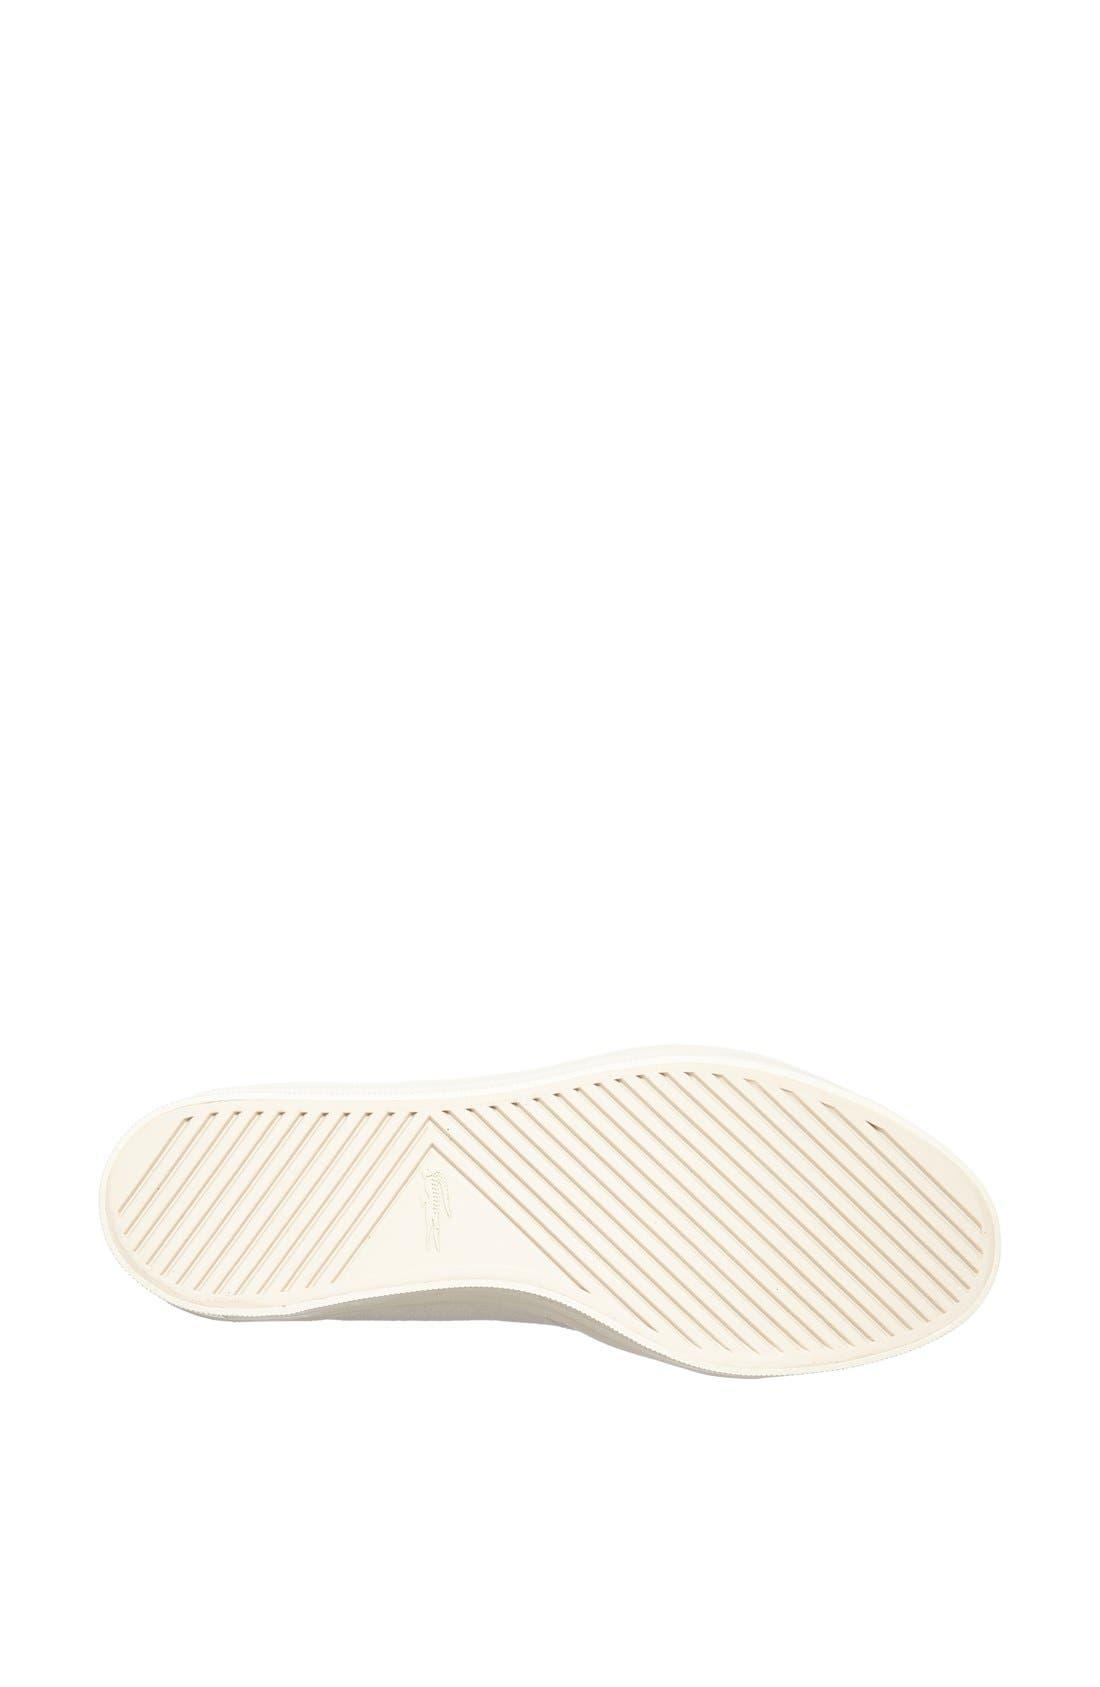 Alternate Image 3  - Lacoste 'Kirton' Platform Sneaker (Women) (Online Exclusive)